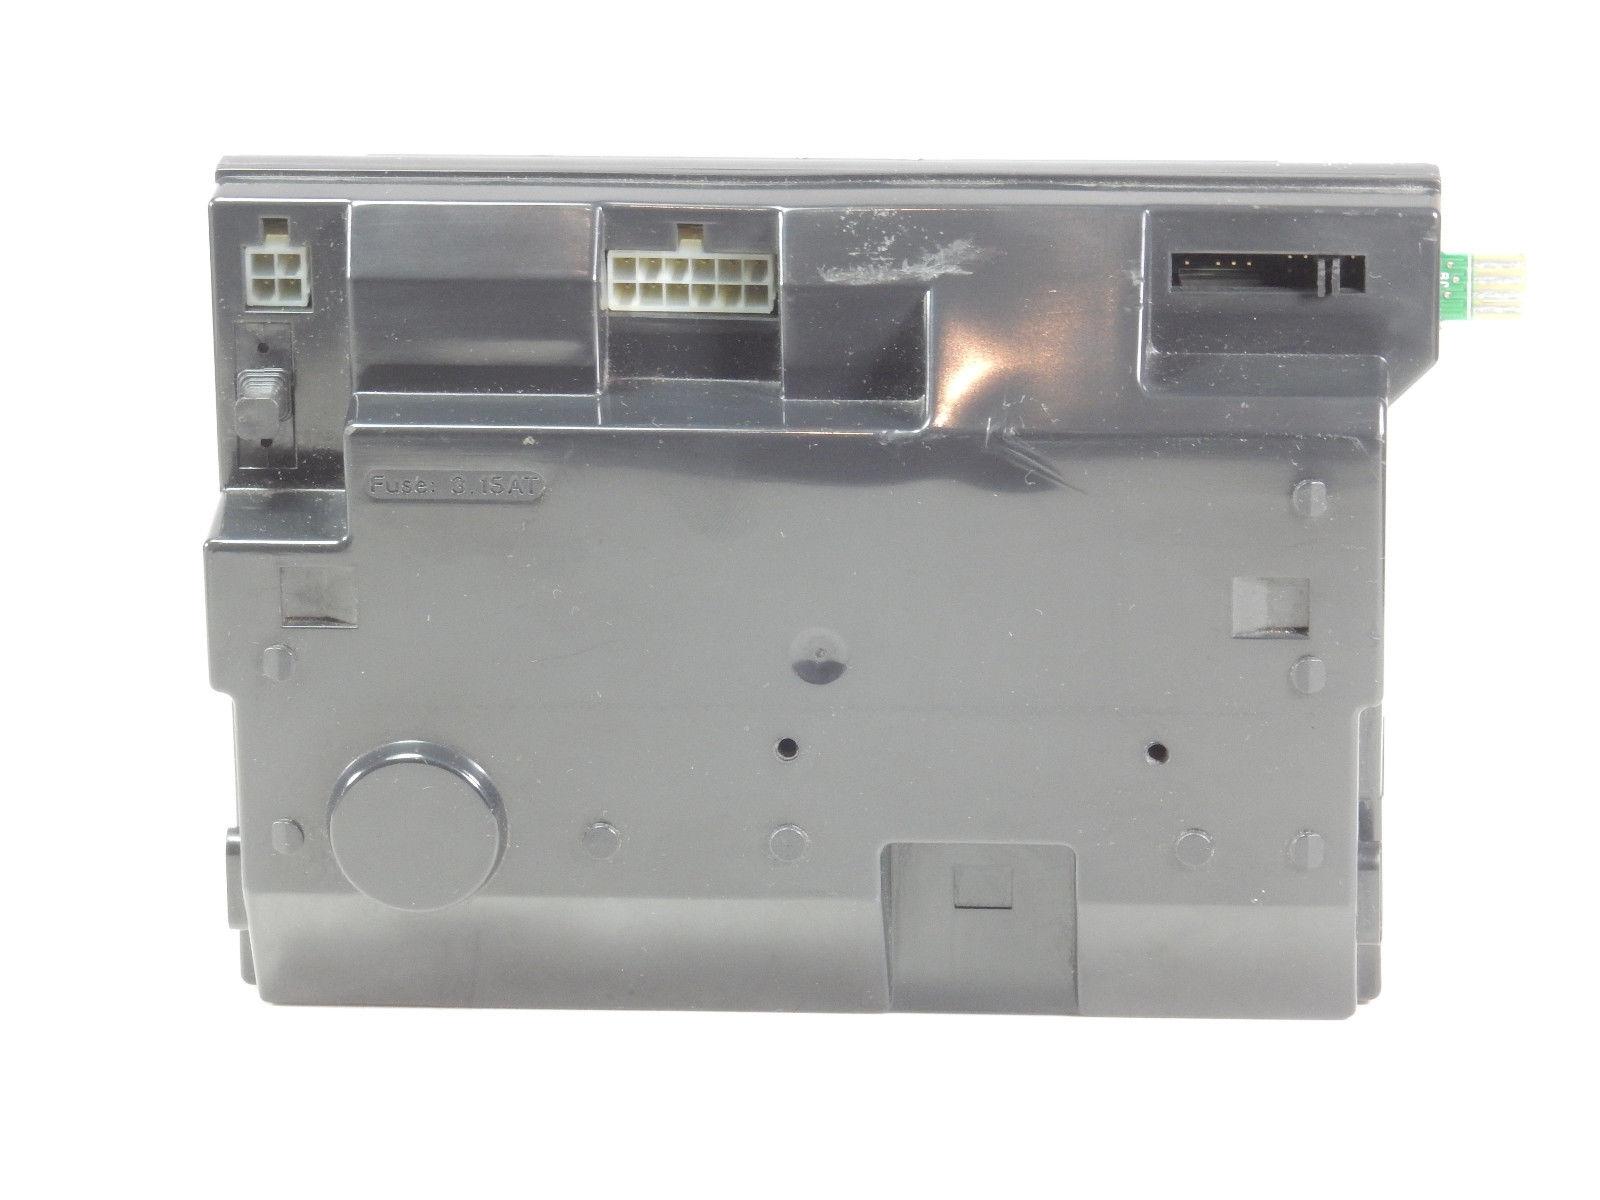 IDEALE Isar ICOS EVO Messico PCB HE15 he24 HE35 ICOS 174486 173534